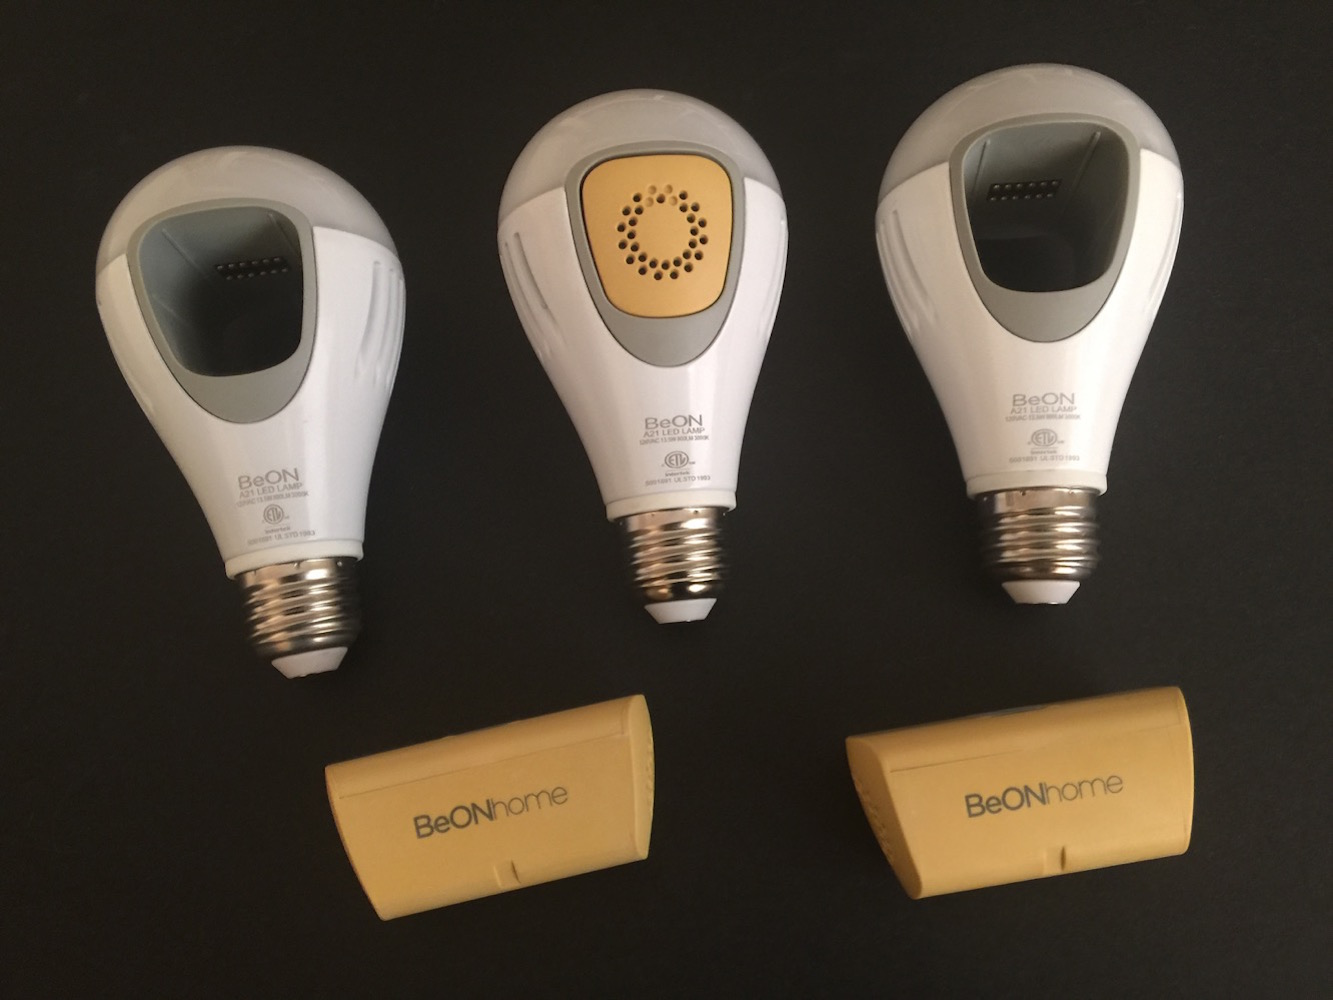 s ebay garden black floodlight free light itm security enclosed halogen bulb lighting